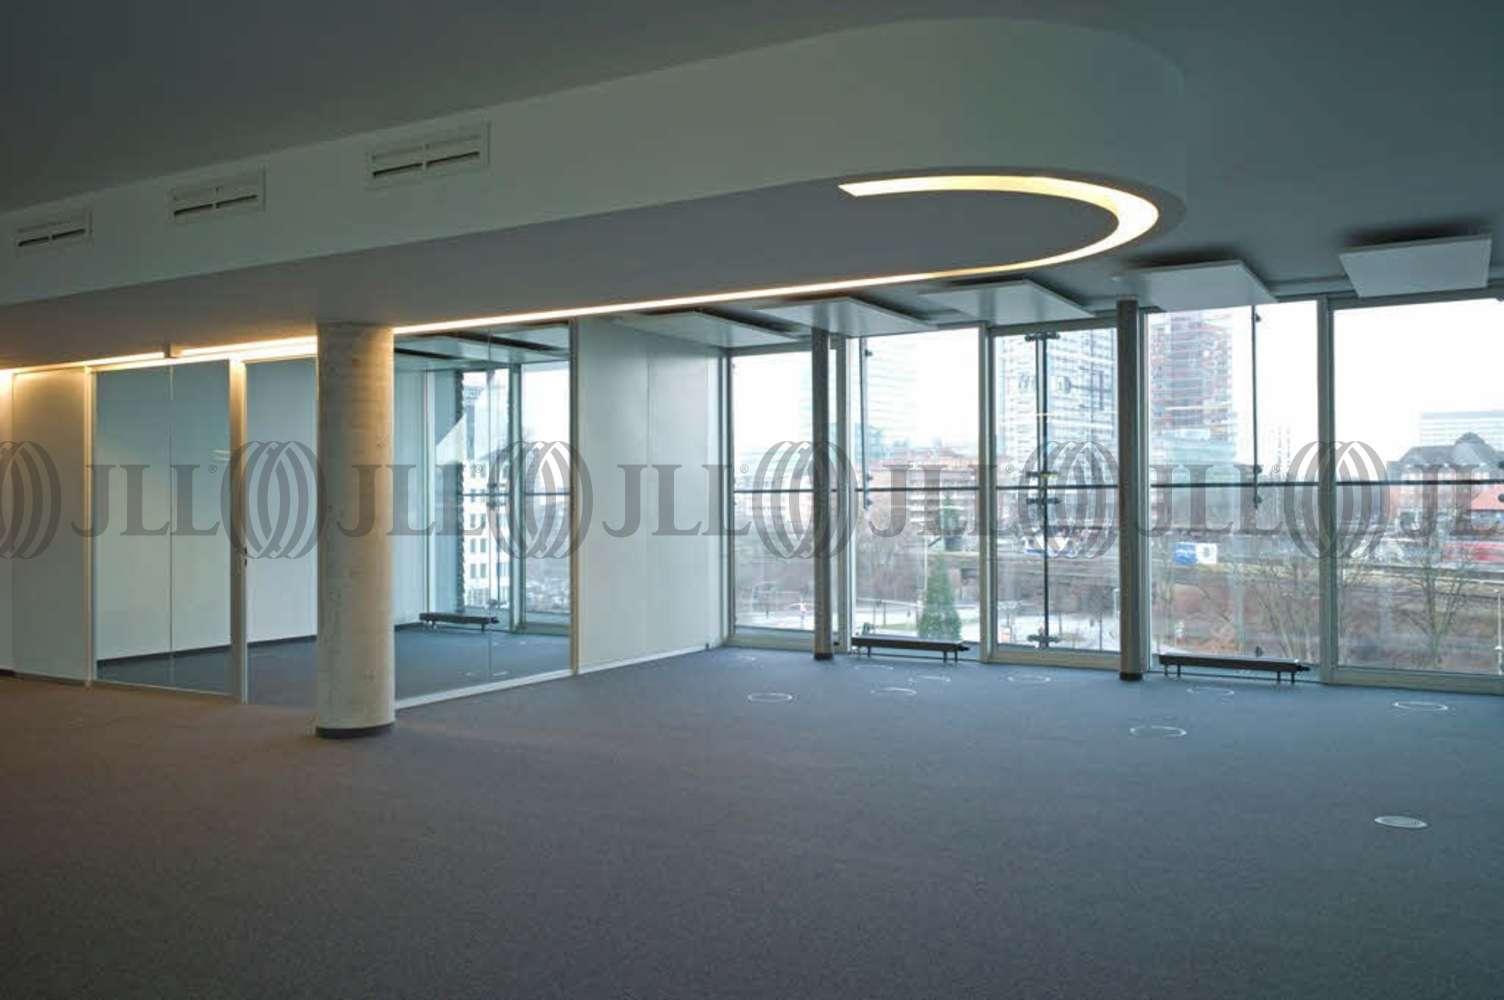 Büros Hamburg, 20537 - Büro - Hamburg, Hammerbrook - H0114 - 9404614